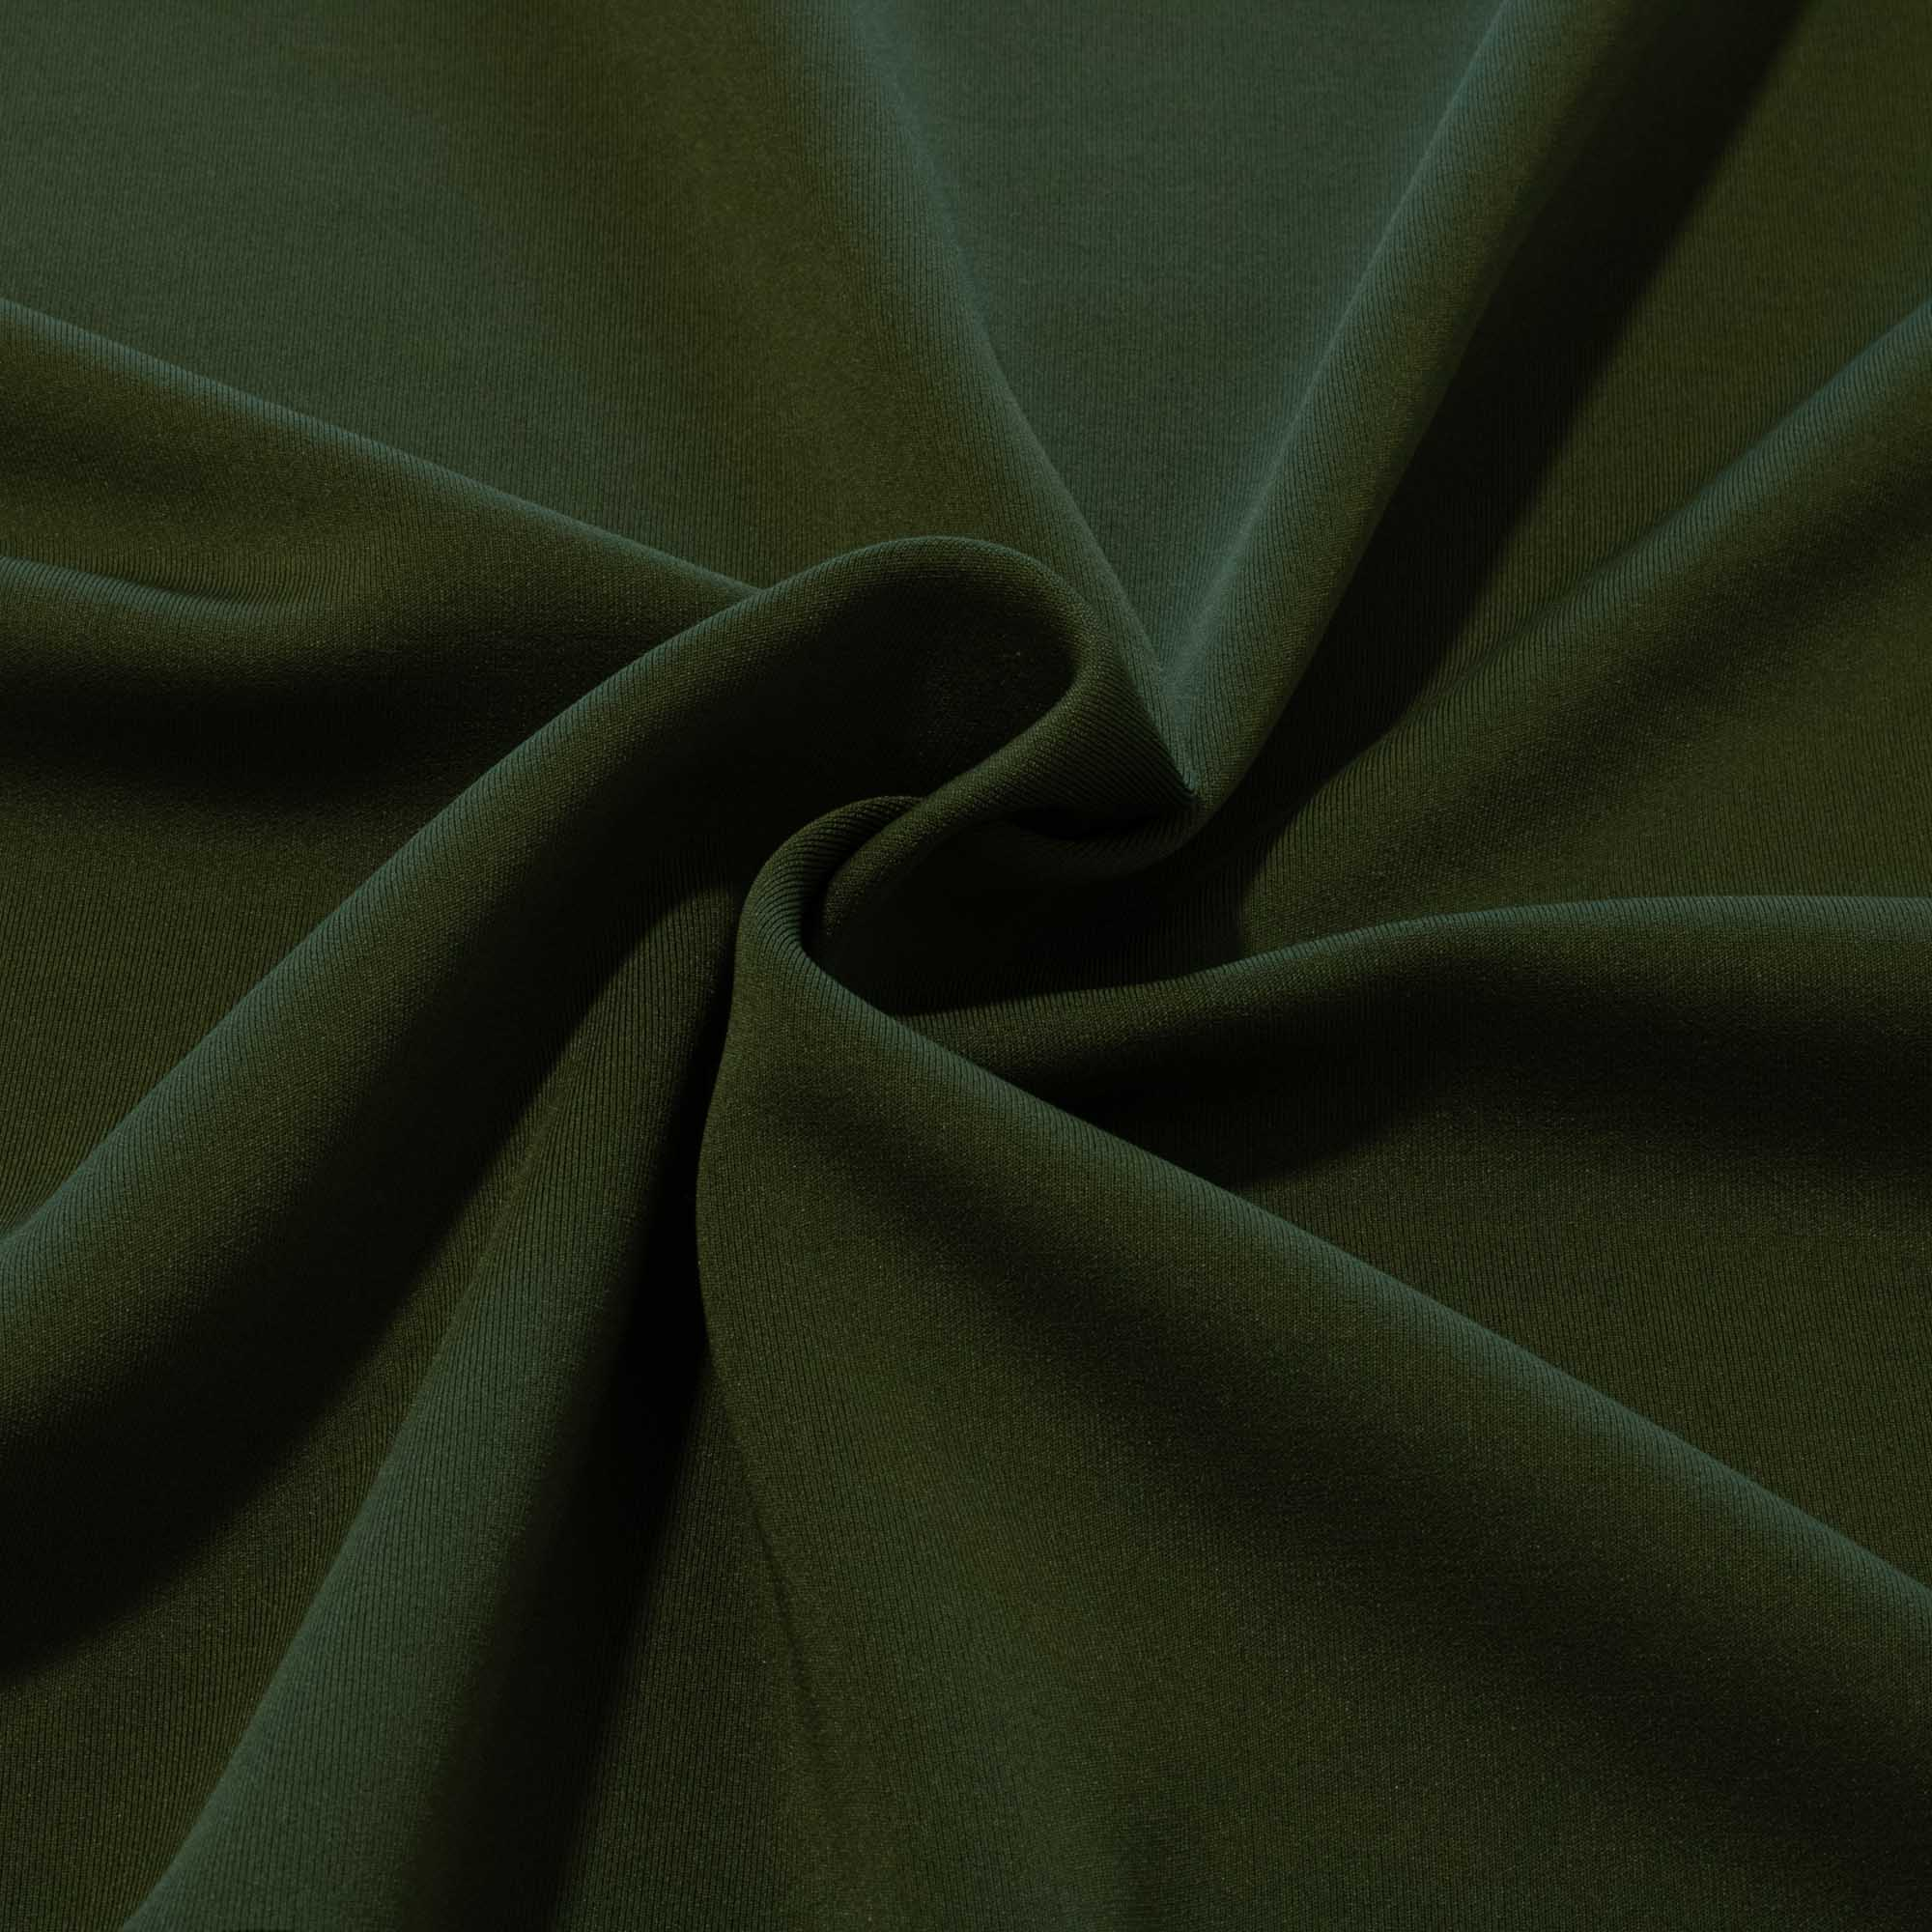 Tecido Malha Neoprene 1,60 m Largura Verde Militar